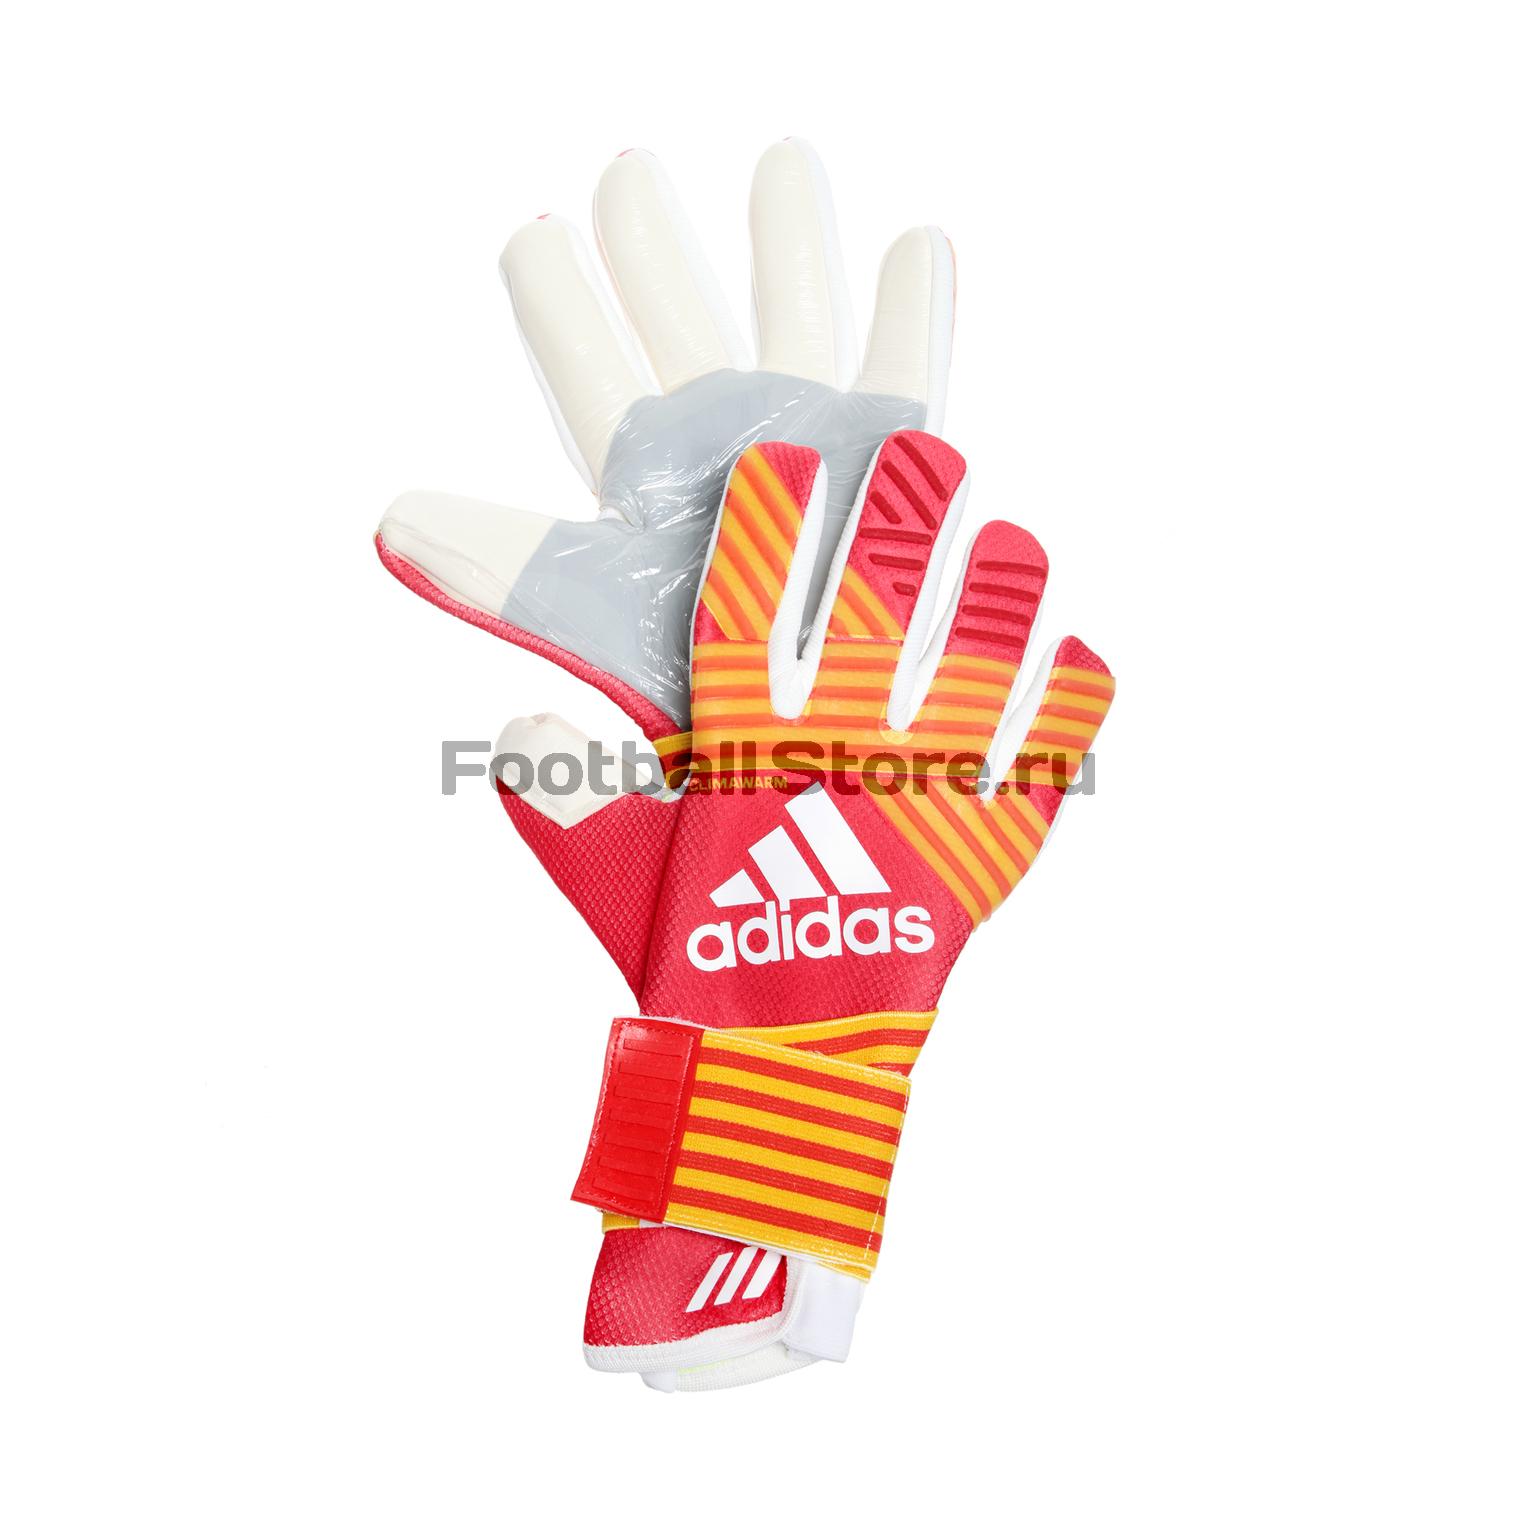 Перчатки вратарские Adidas Ace Trans Clima BS4107 перчатки вратарские adidas ace half neg az3688